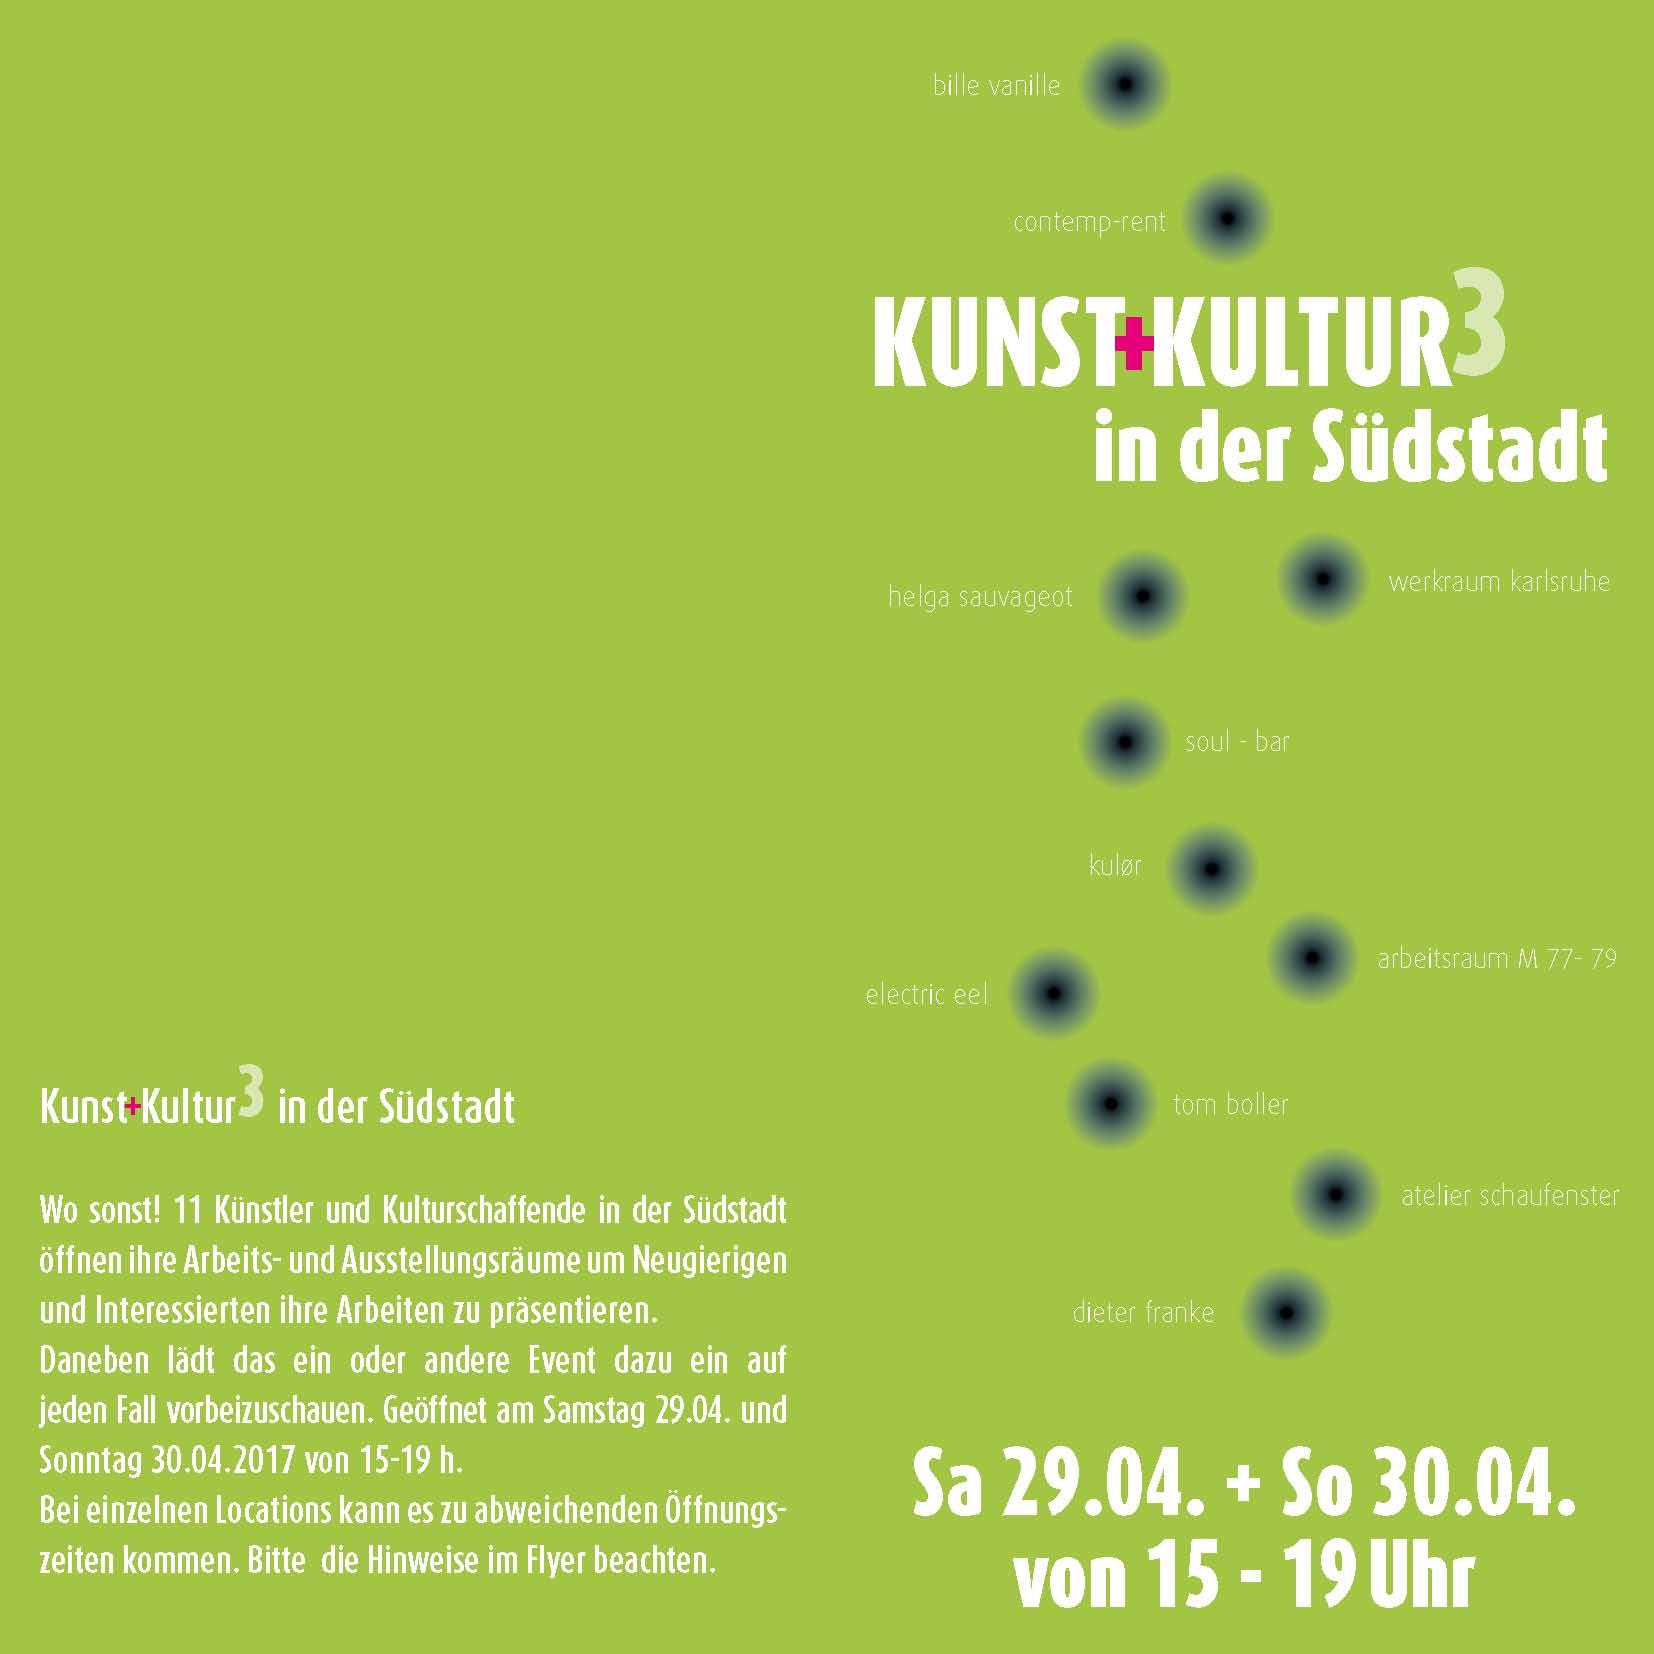 KUNST + KULTUR 3